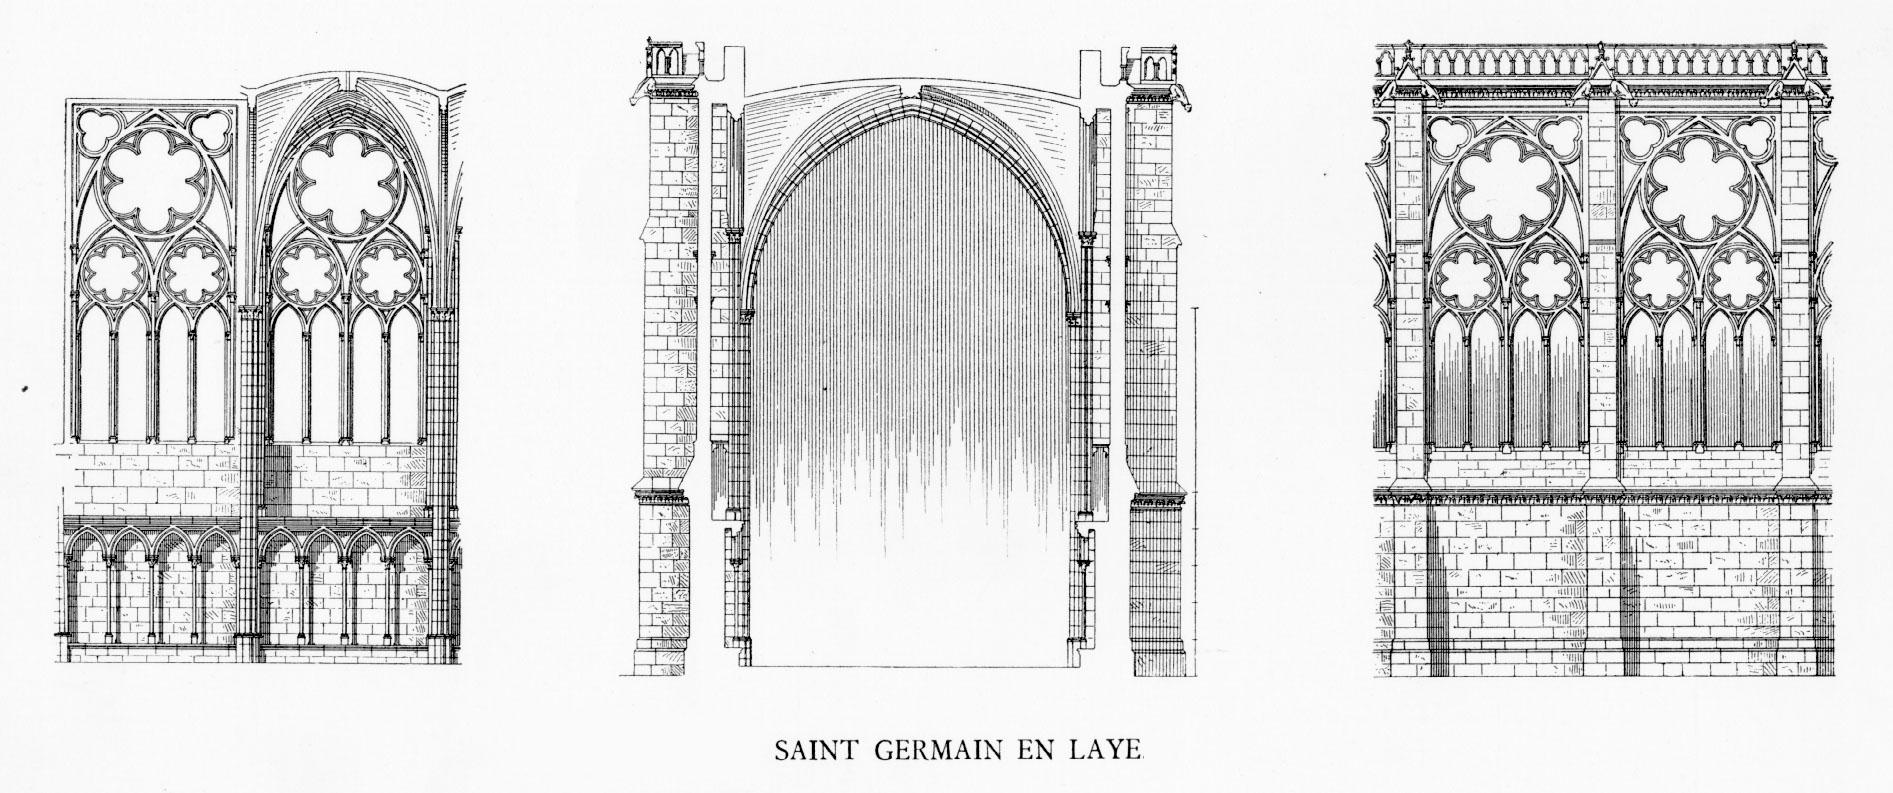 St germain en laye - Cours de cuisine saint germain en laye ...